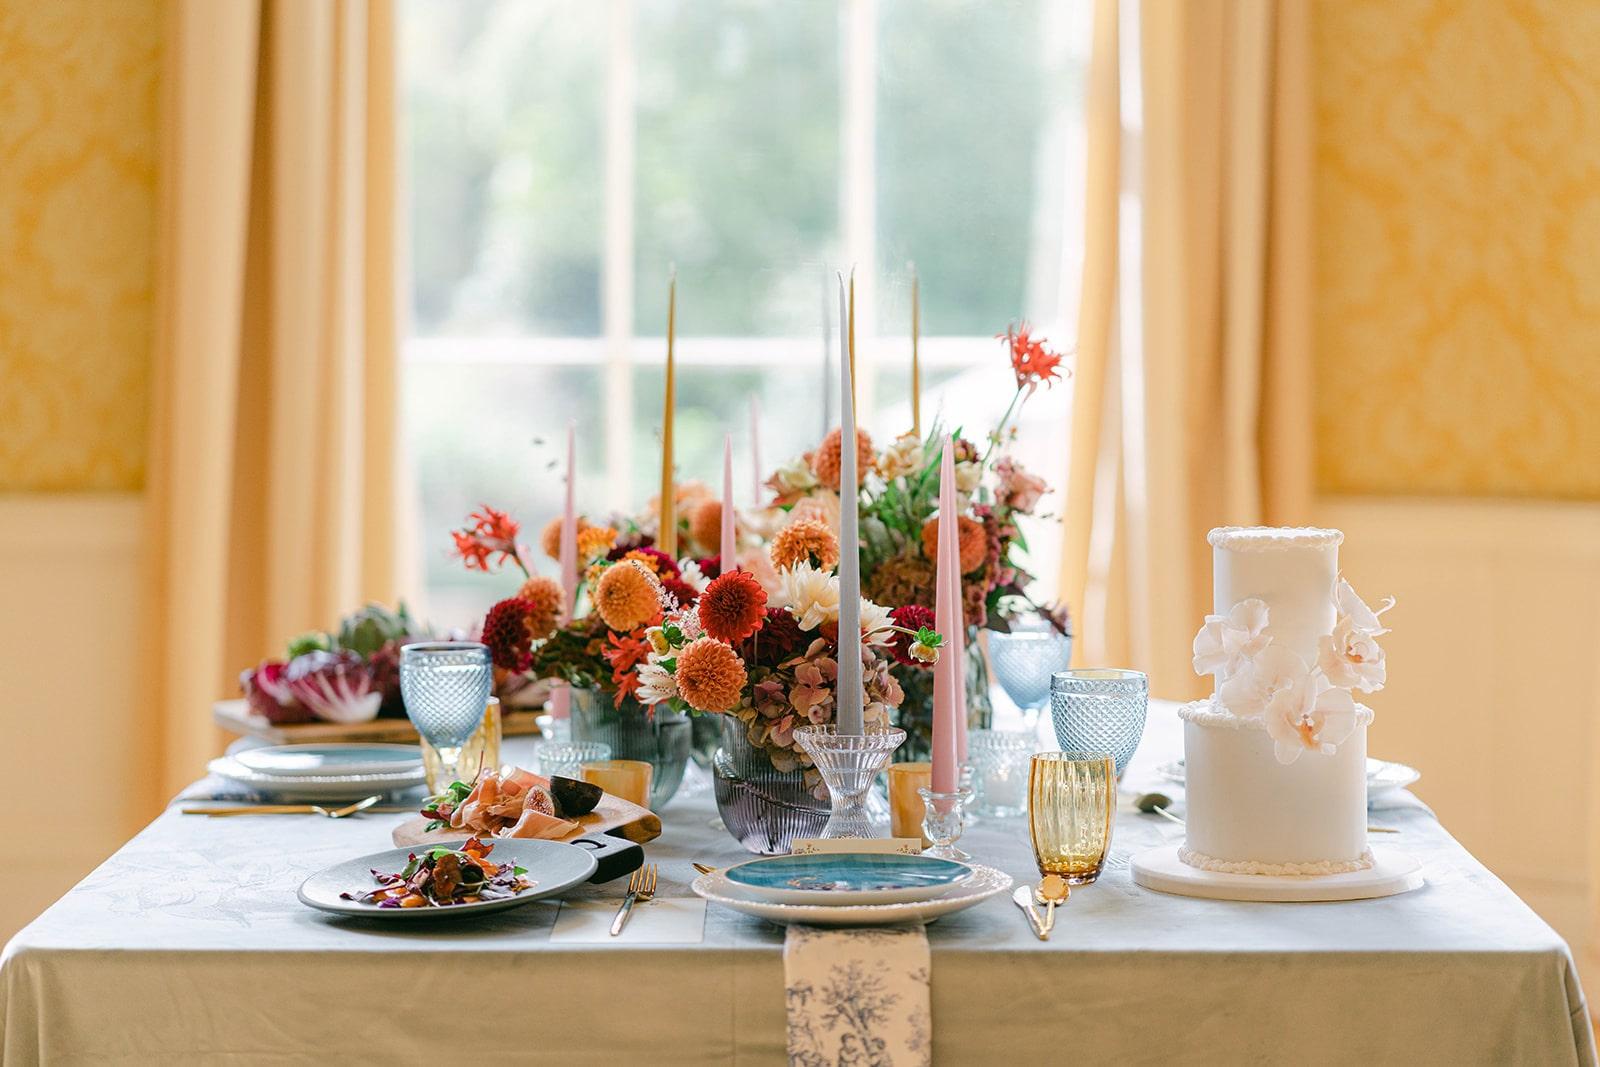 Museum of Literature Ireland wedding table décor